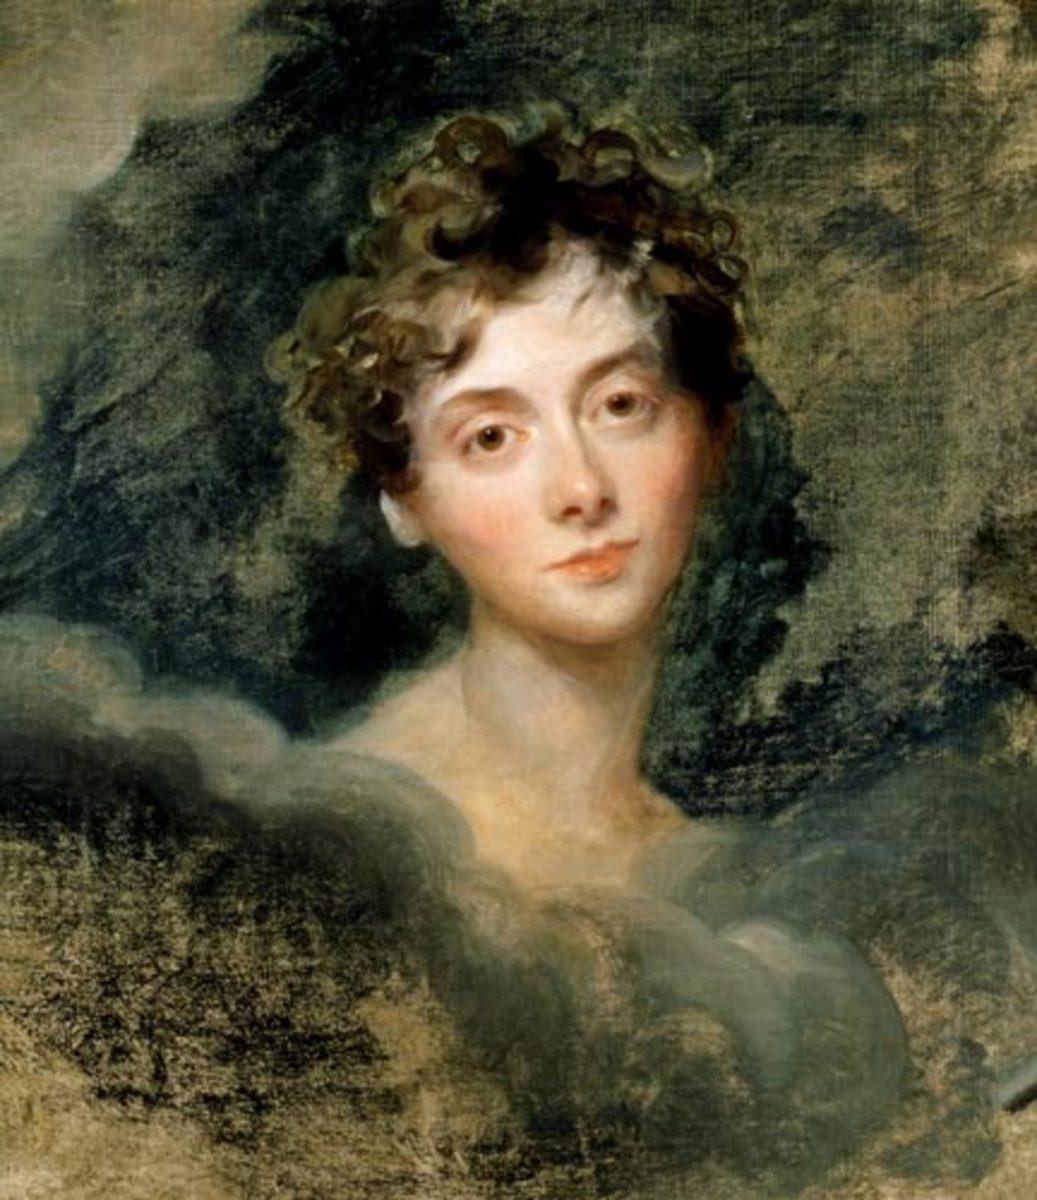 An 1805 portrait of Lady Caroline Lamb. You go girl!